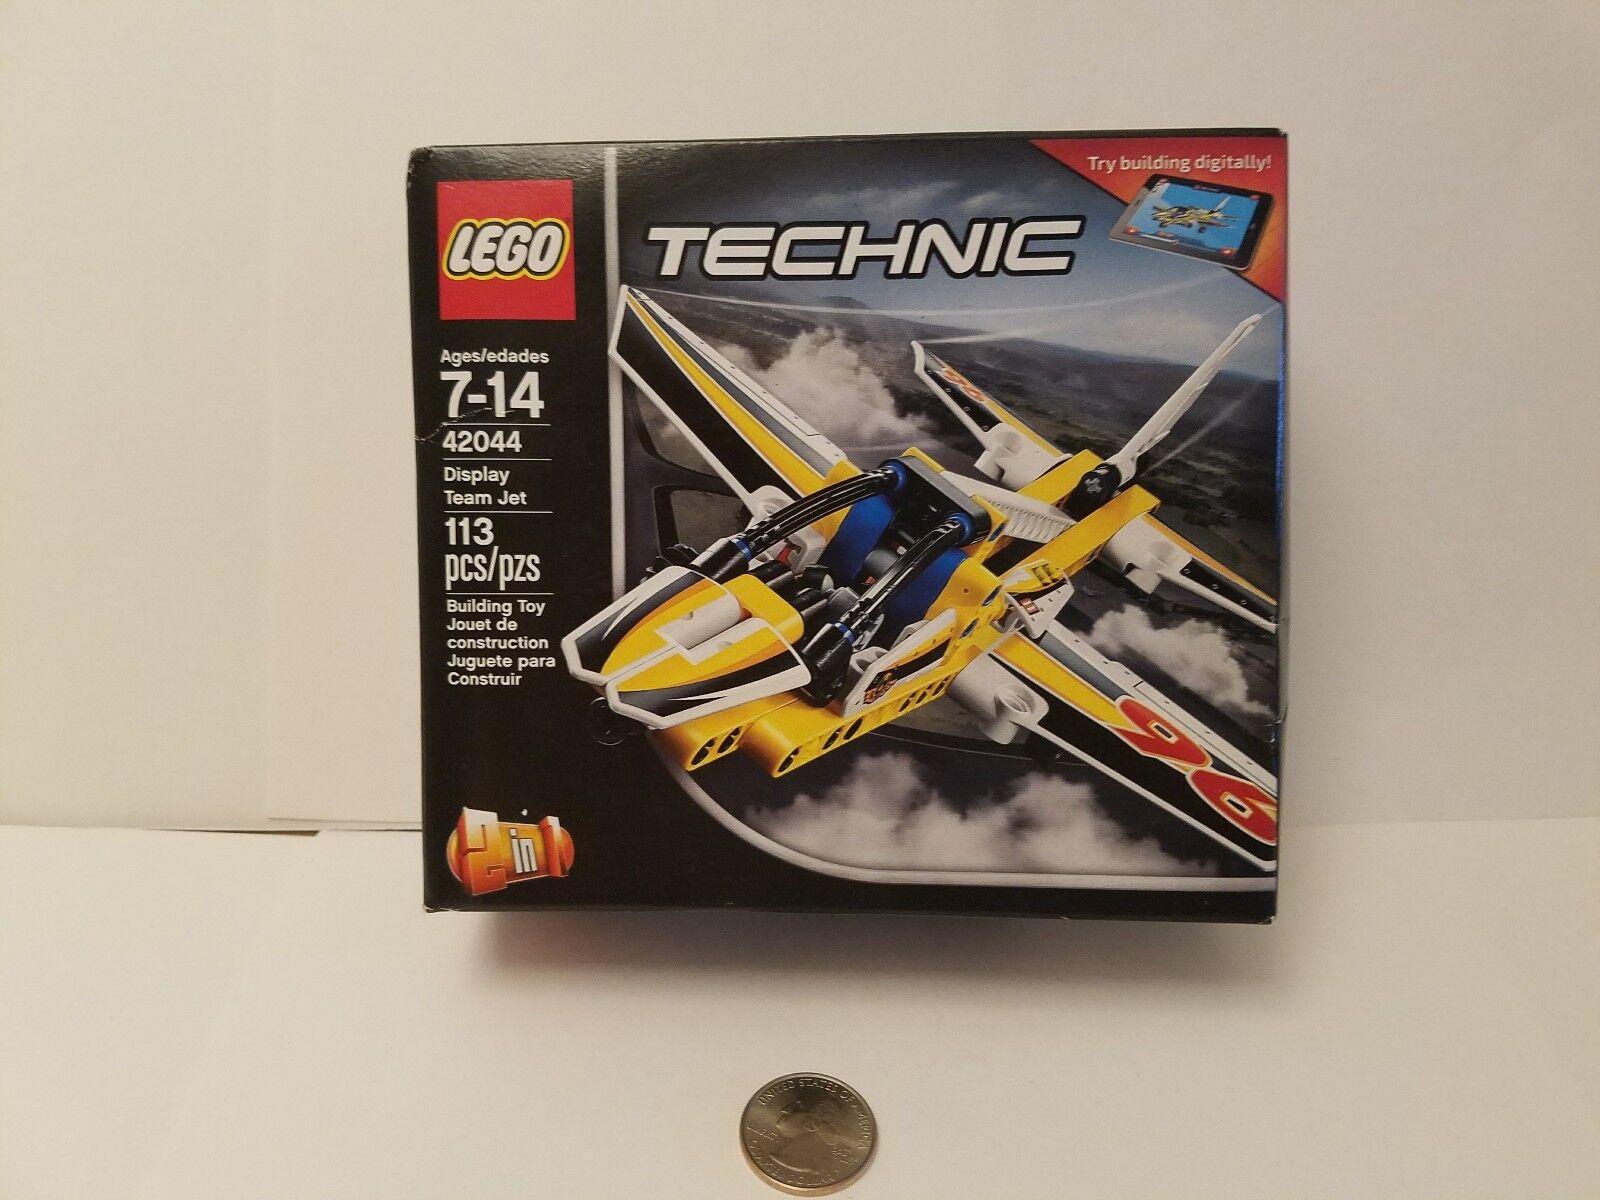 New  Lego Technic 42044 Display Team Jet-113 pieces. Great set little set Great 1fdebf